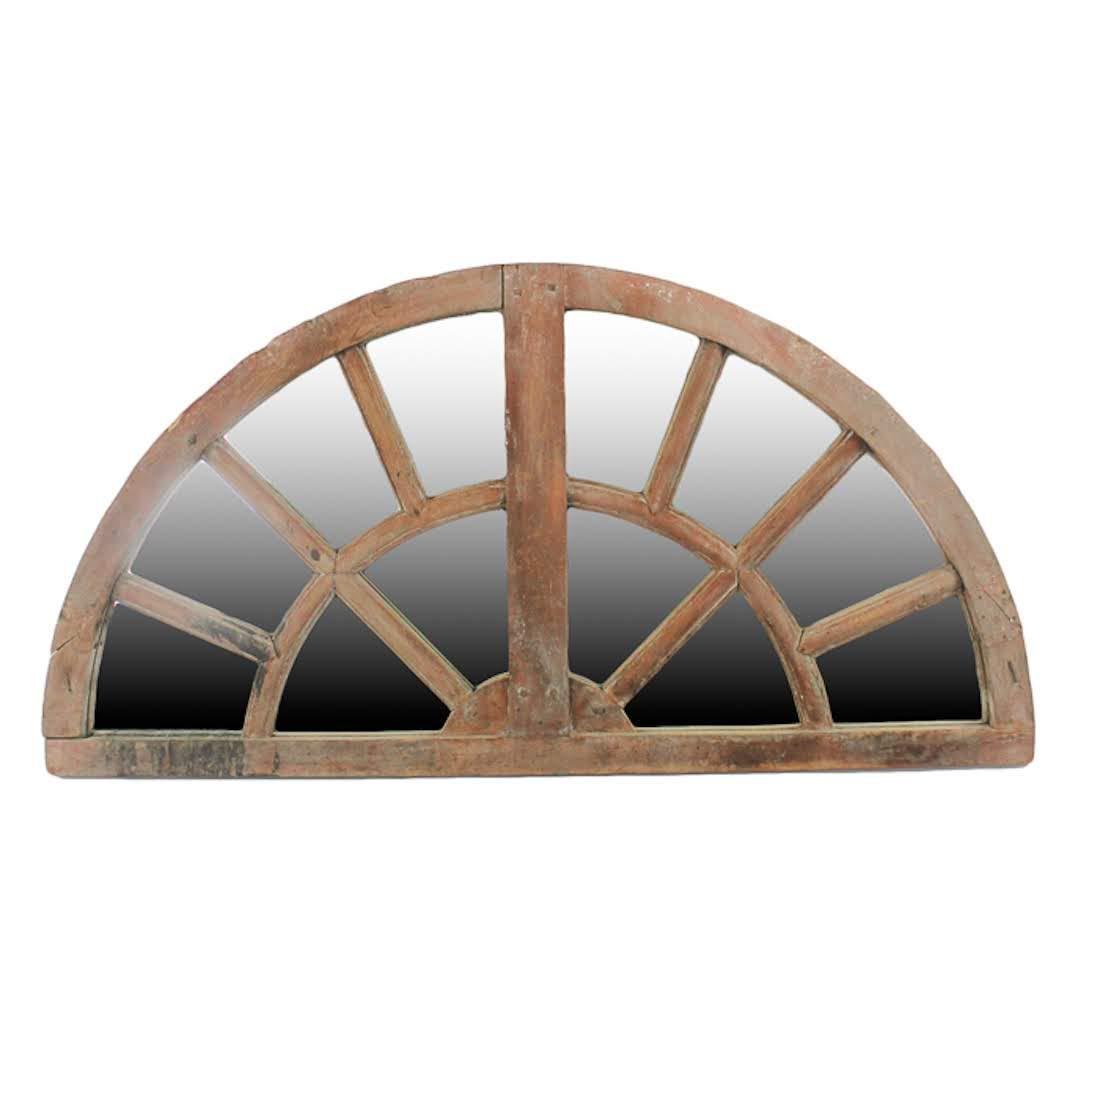 Antique Semi-Circular Wooden Transom Window Mirror